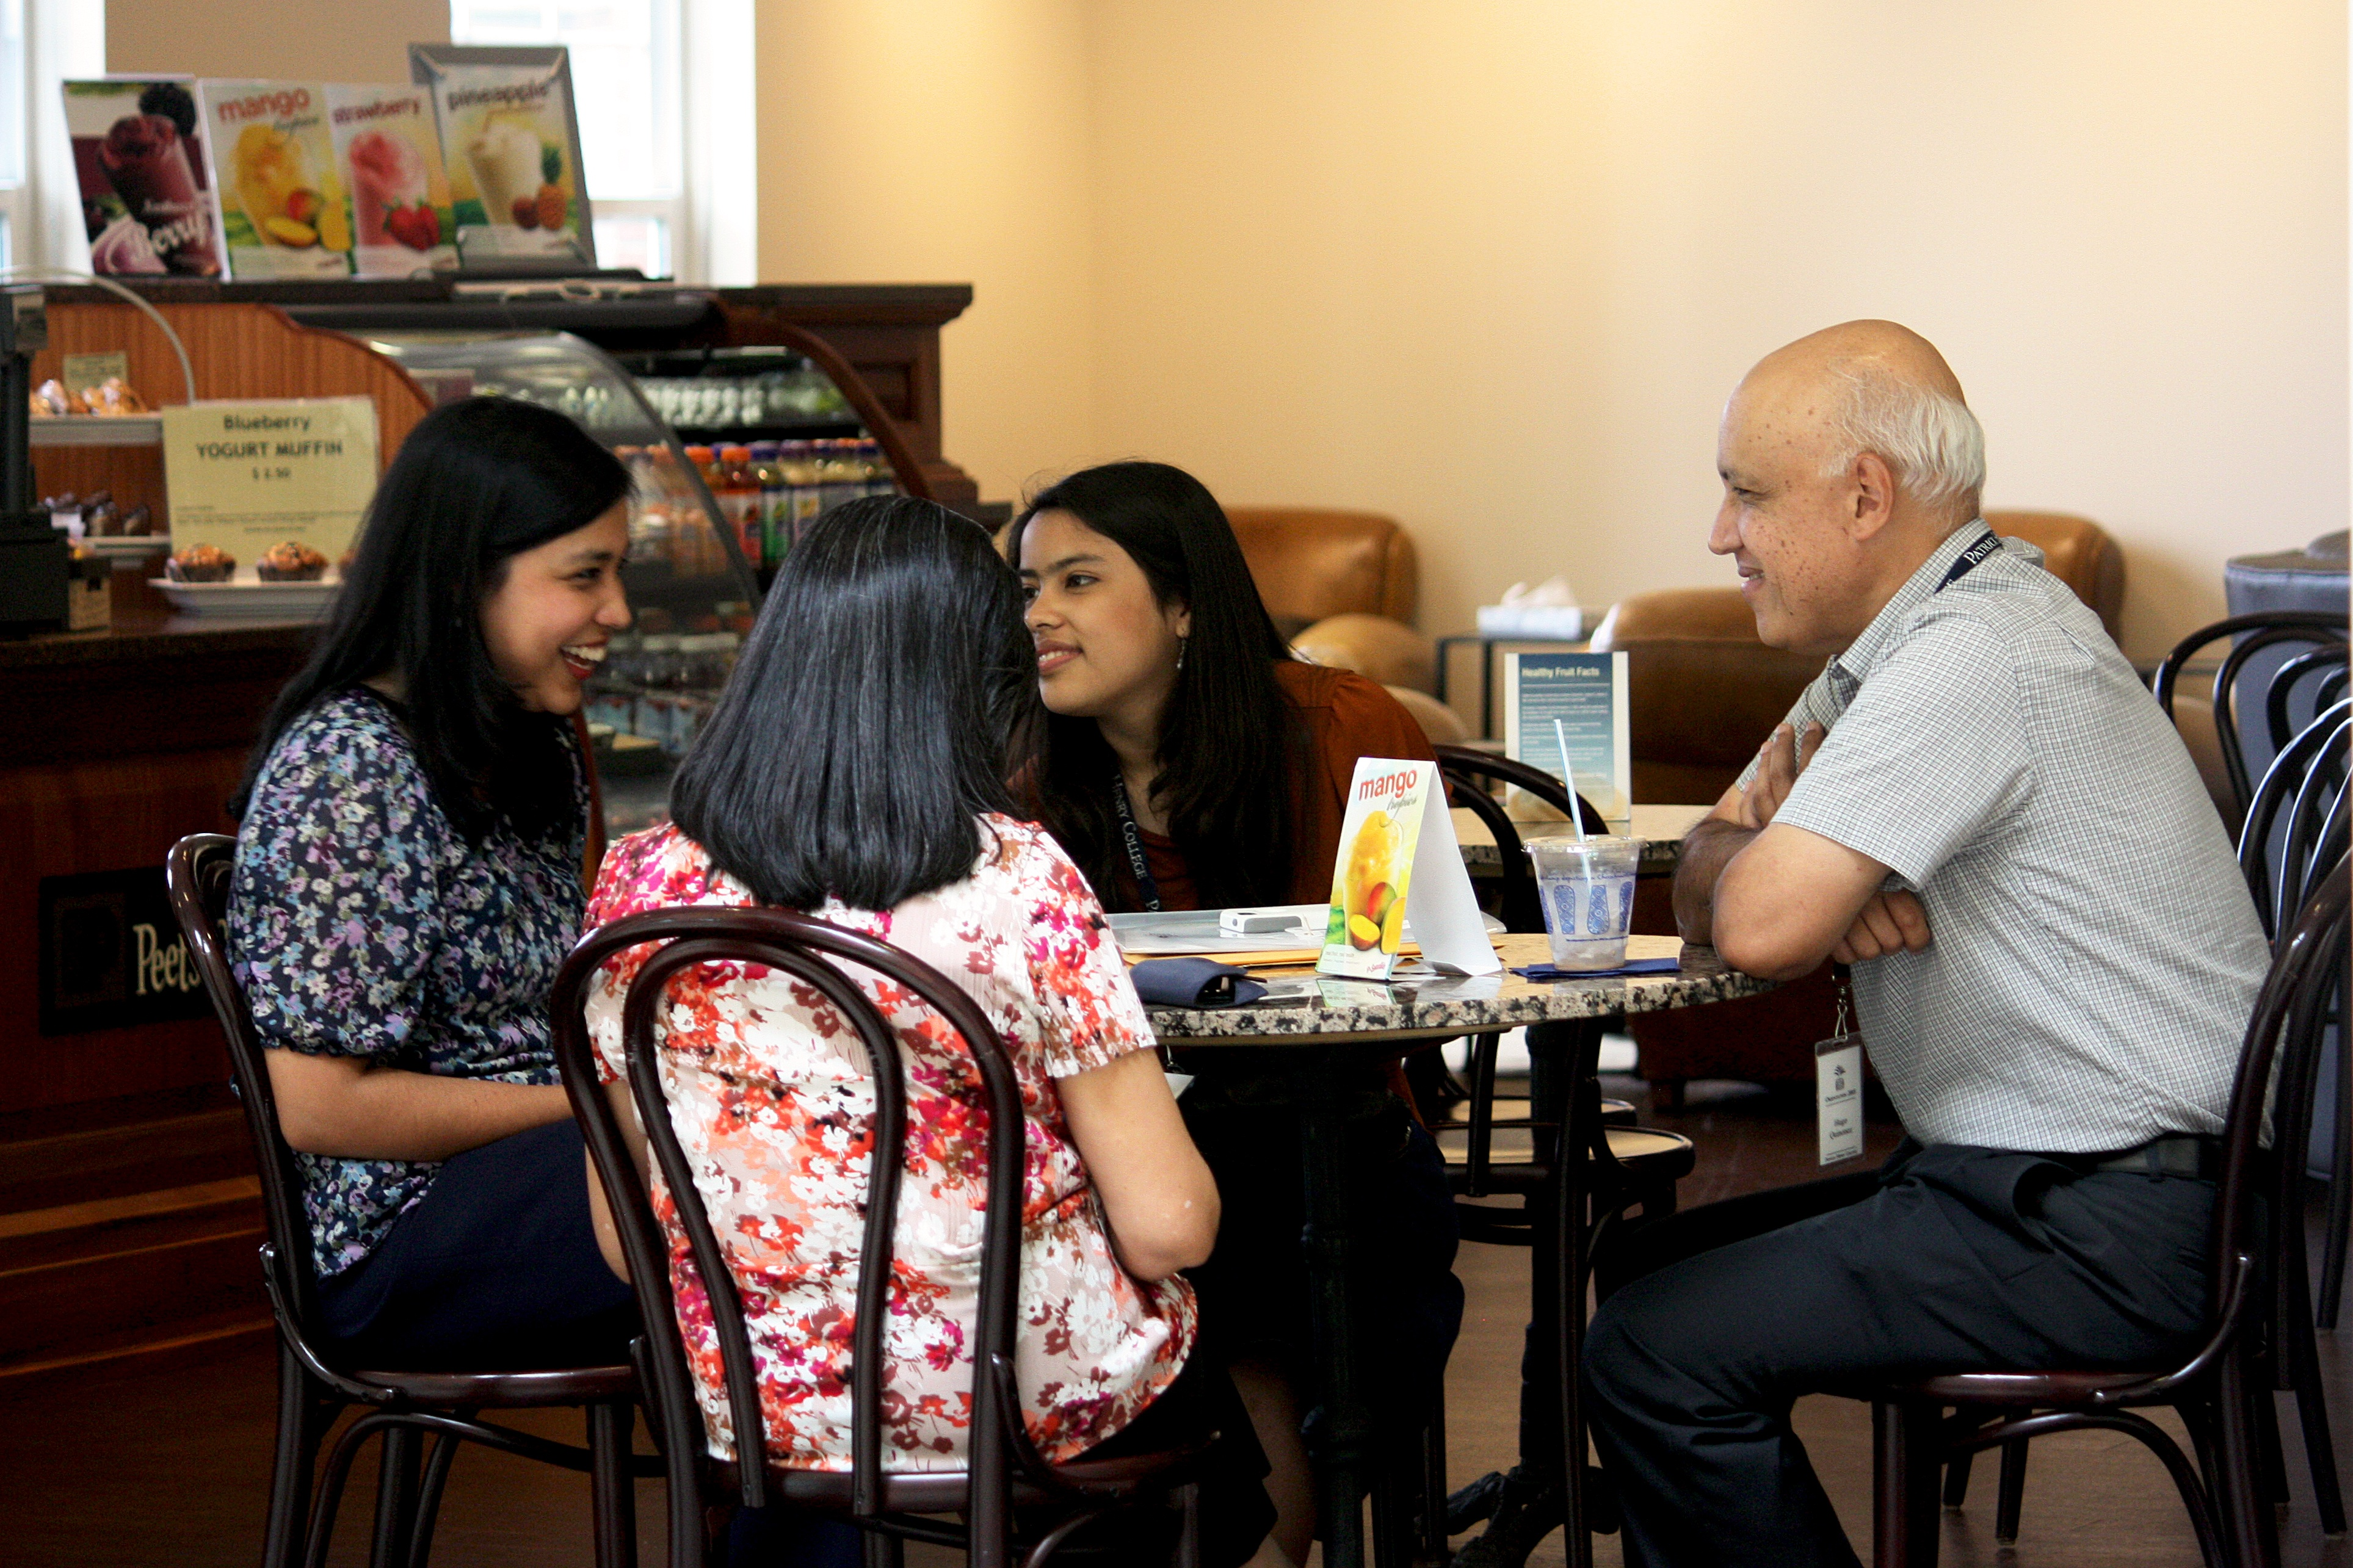 Freshman_Orientation_2015_student_family_parents_coffeeshop_1.jpg